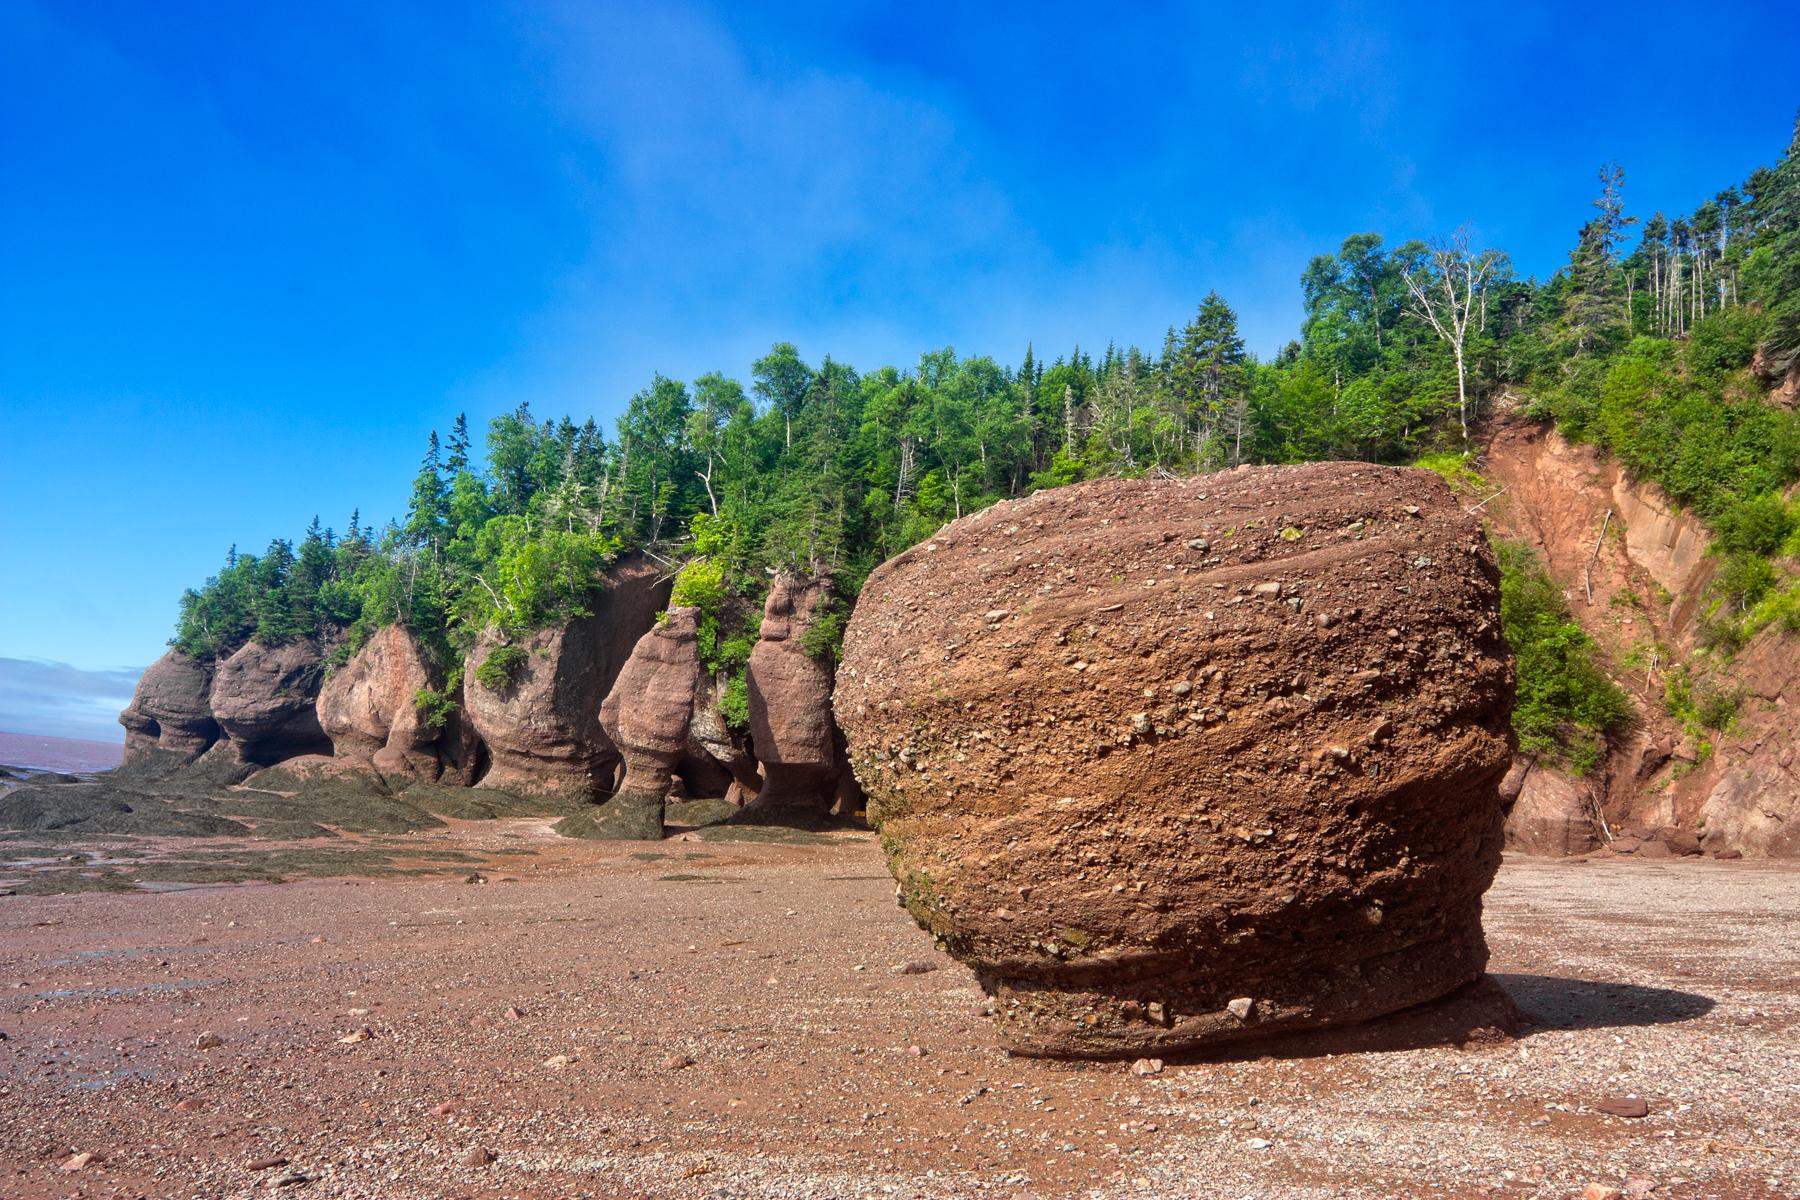 Flowerpot rocks - hdr photo